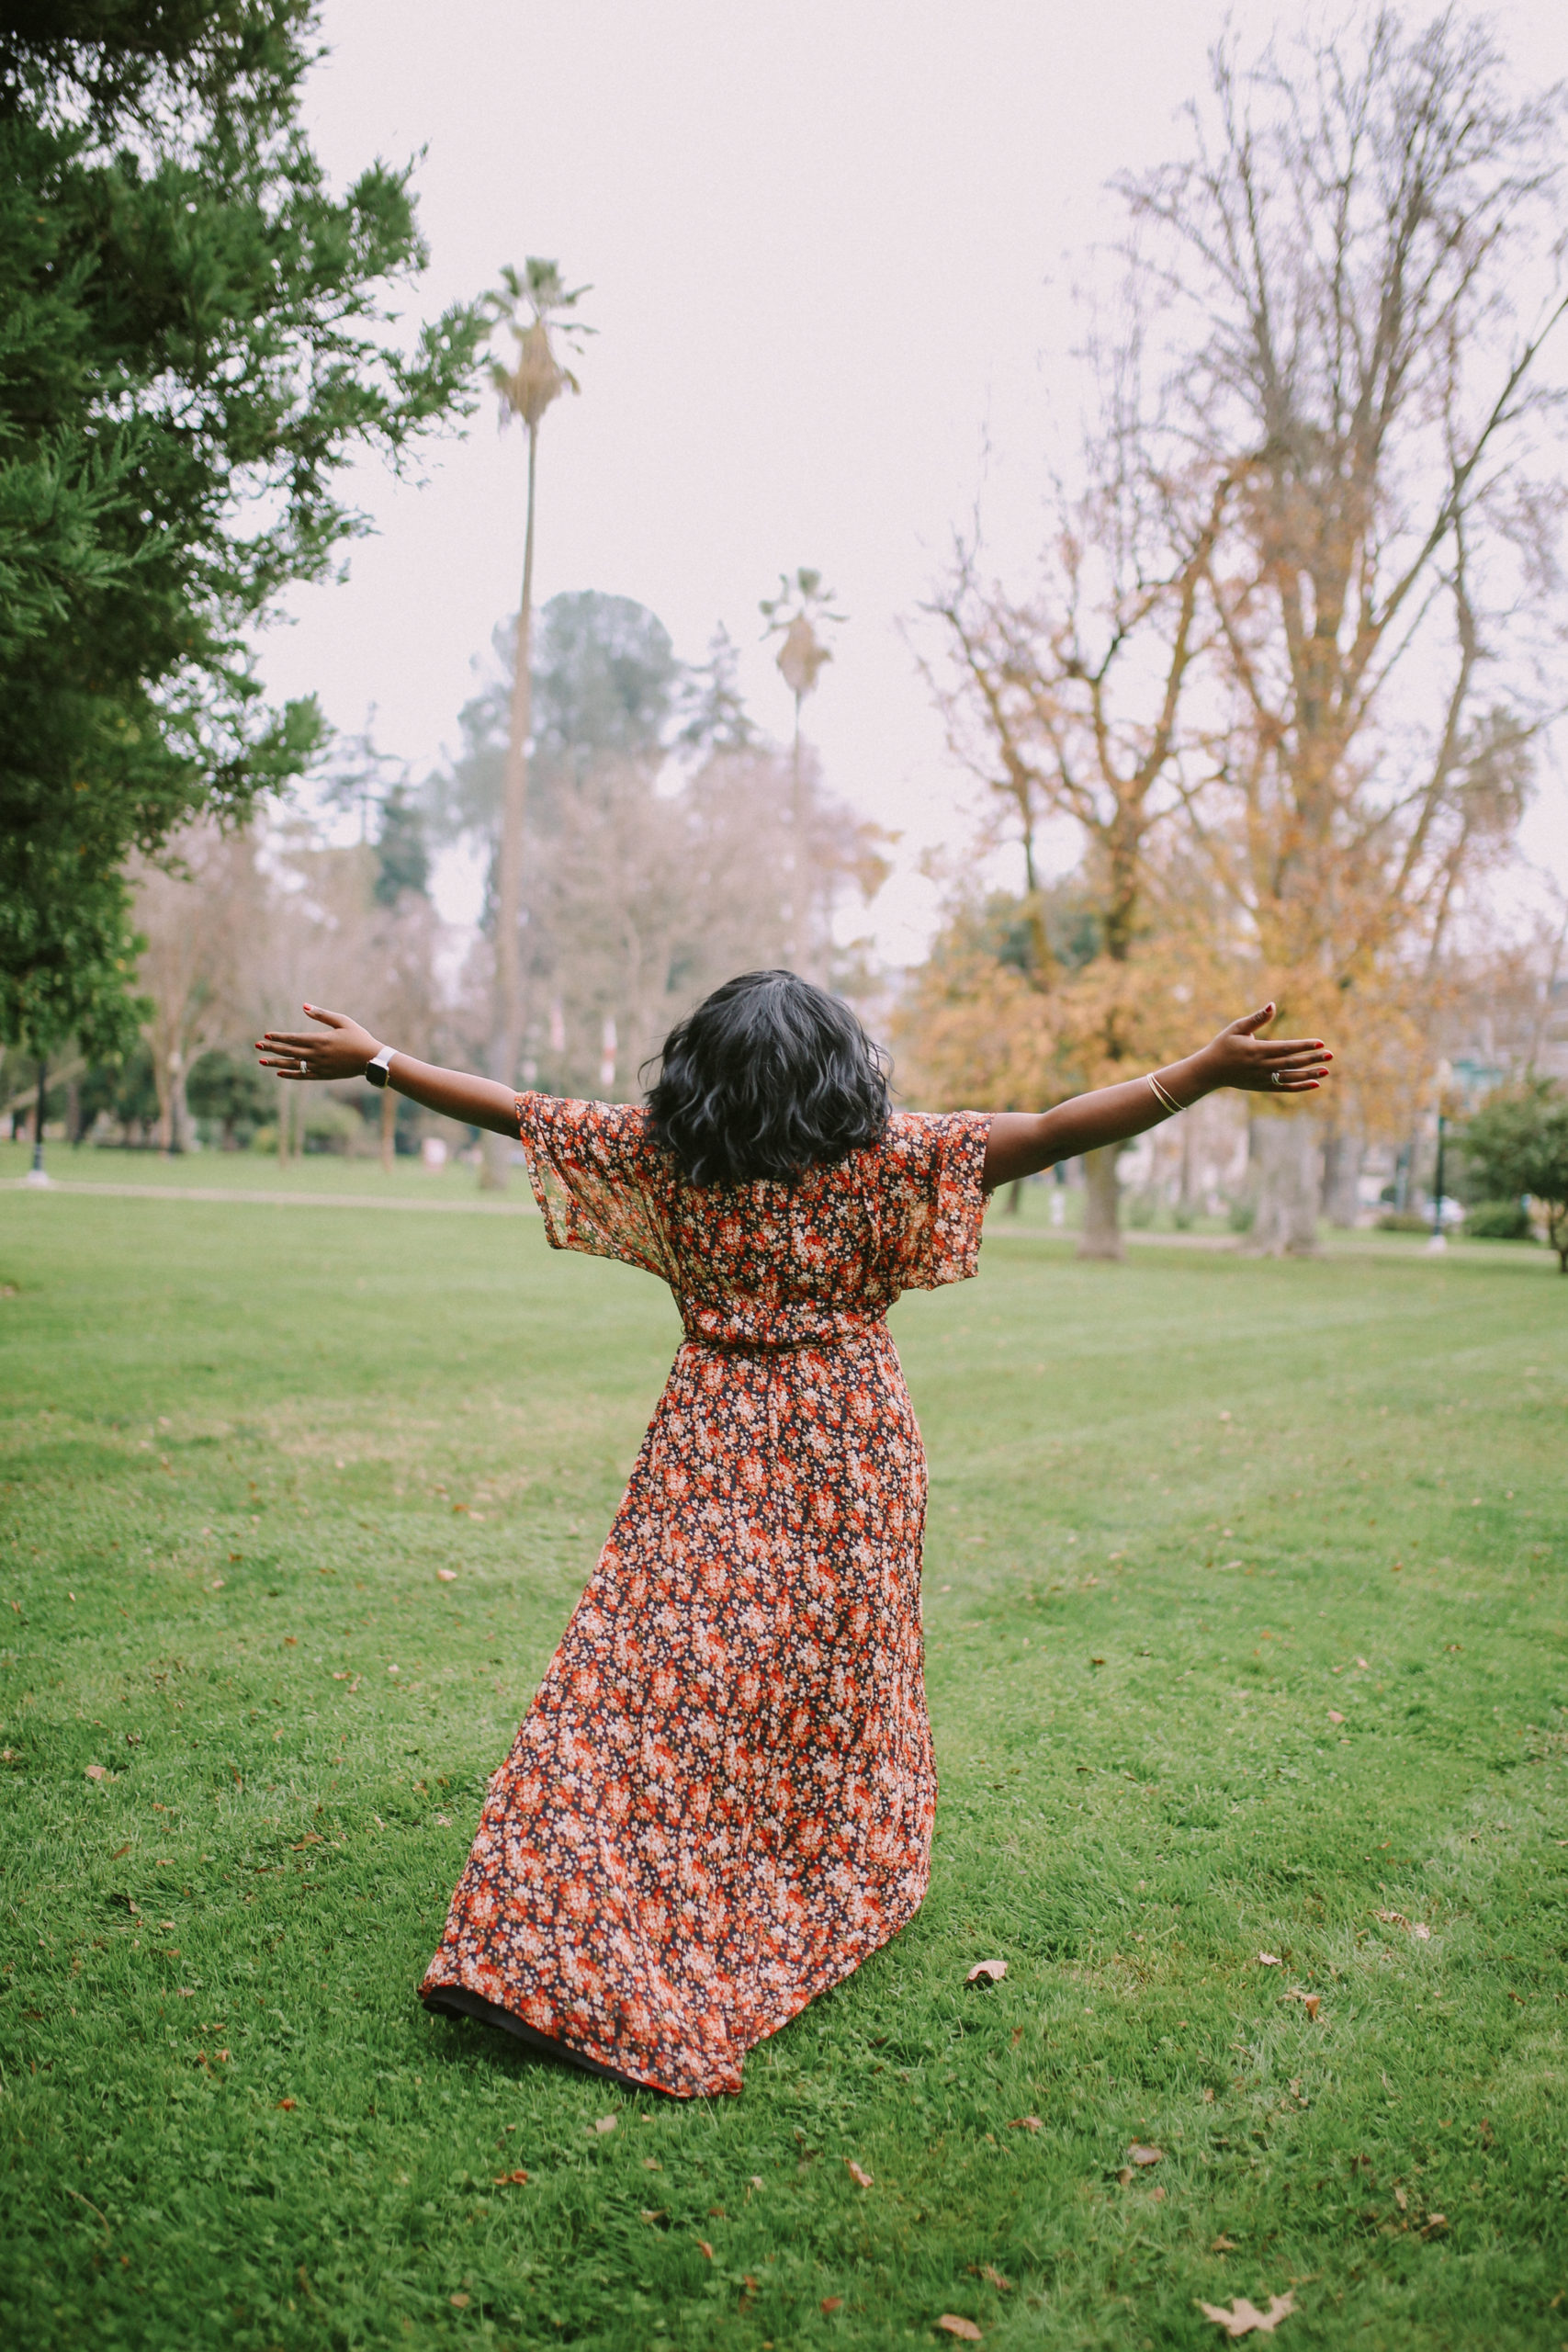 Ruthie Ridley Blog: 5 Year Blogiversary